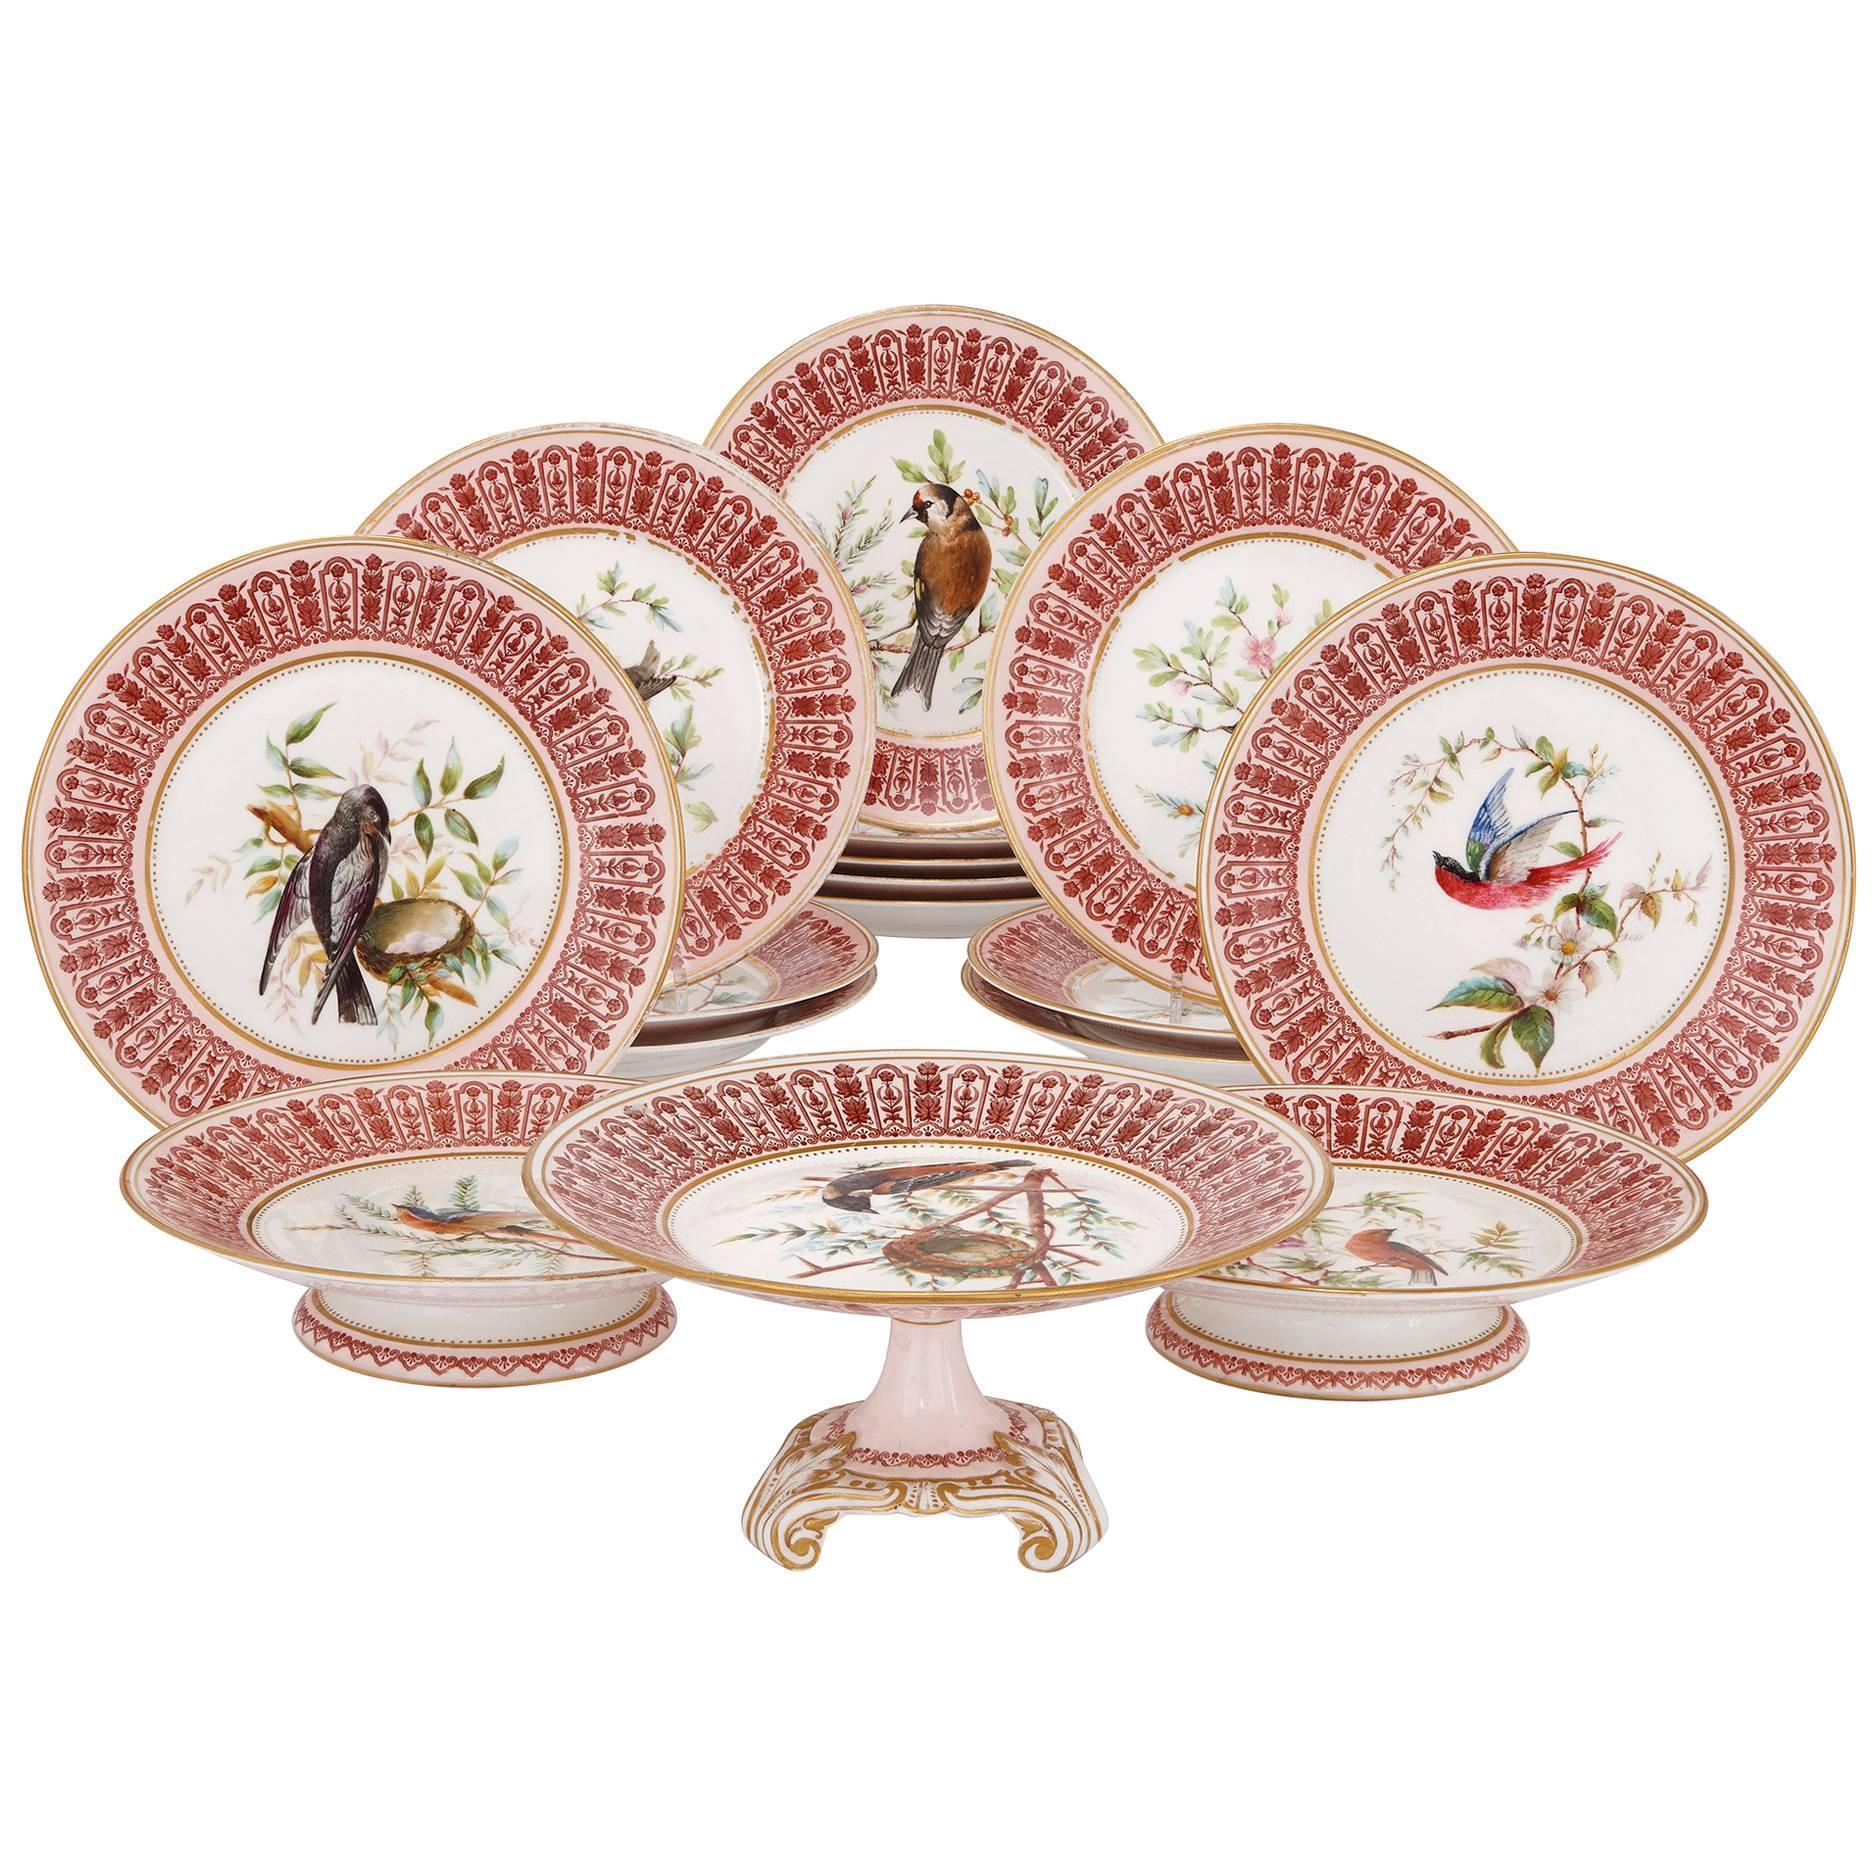 Antique English Sixteen-Piece Dessert Service by Royal Crown Derby Porcelain